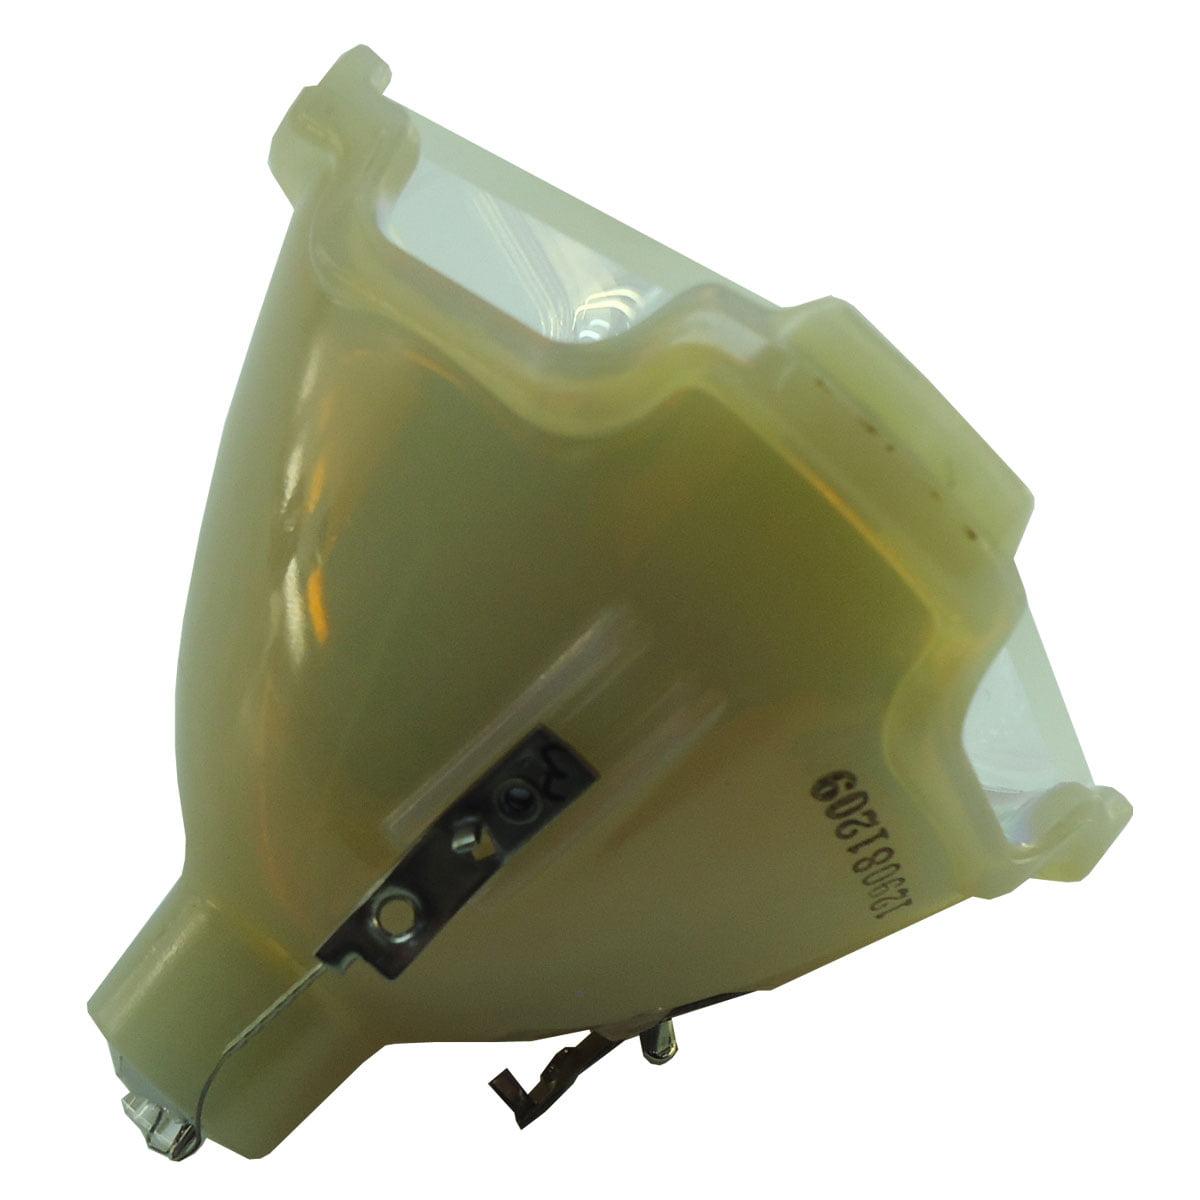 Lutema Platinum for Christie LX66 Projector Lamp (Original Philips Bulb) - image 4 de 5